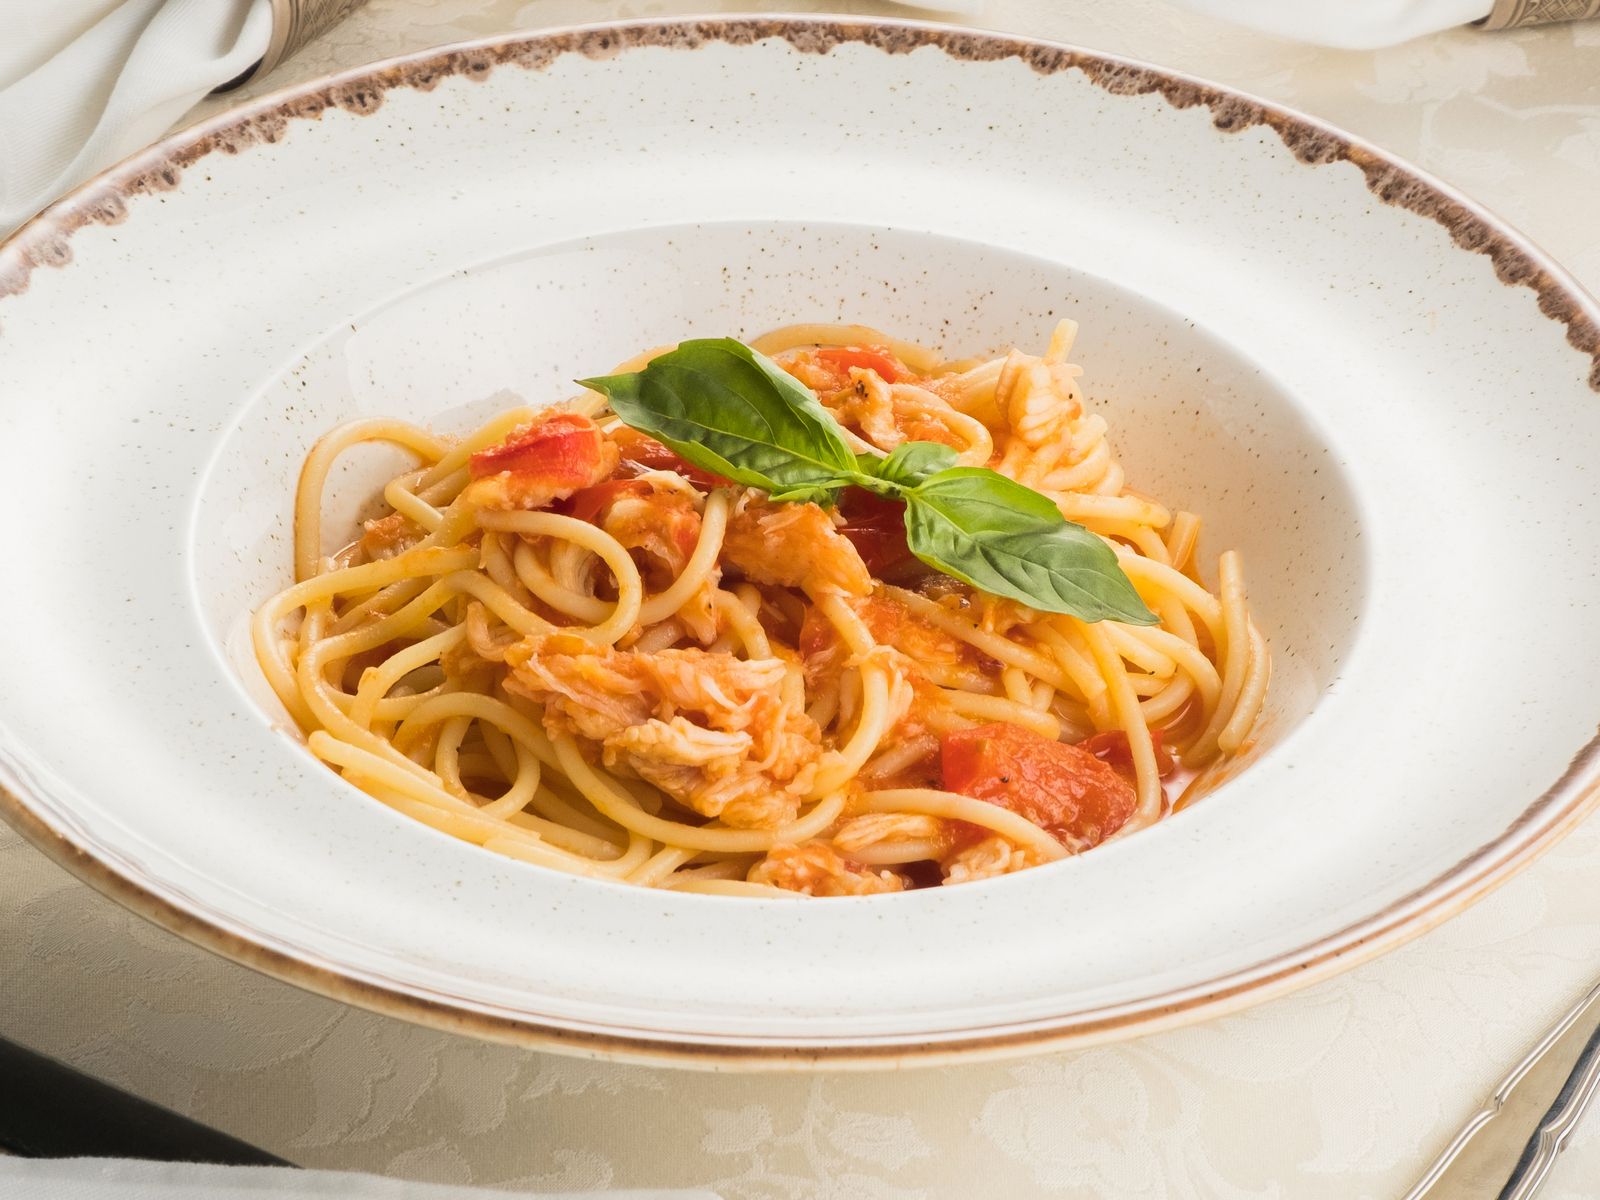 Спагетти с камчатским крабом в томатном соусе